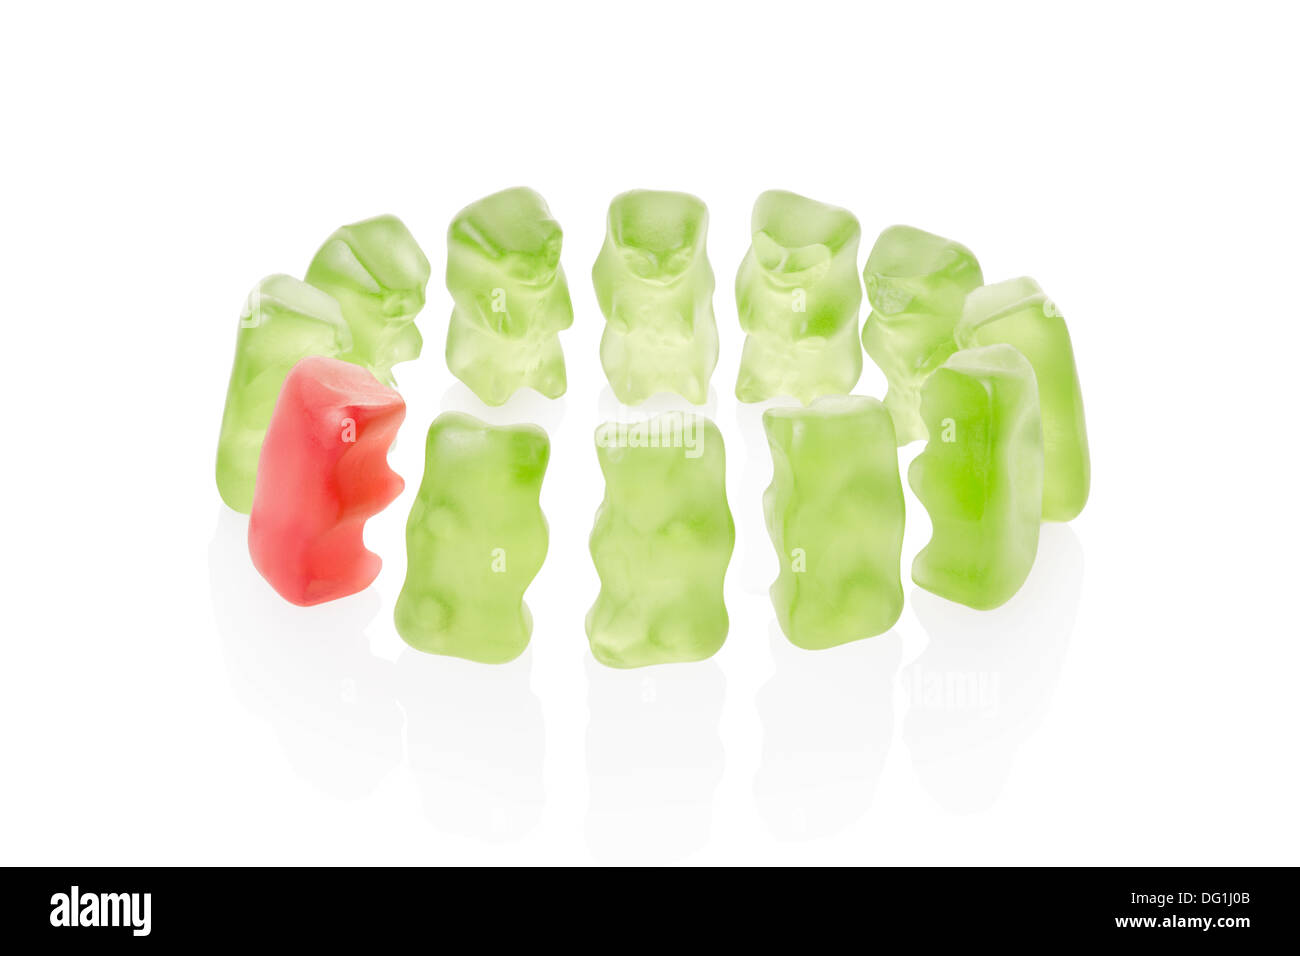 Gummy bears meeting, leadership concept - Stock Image